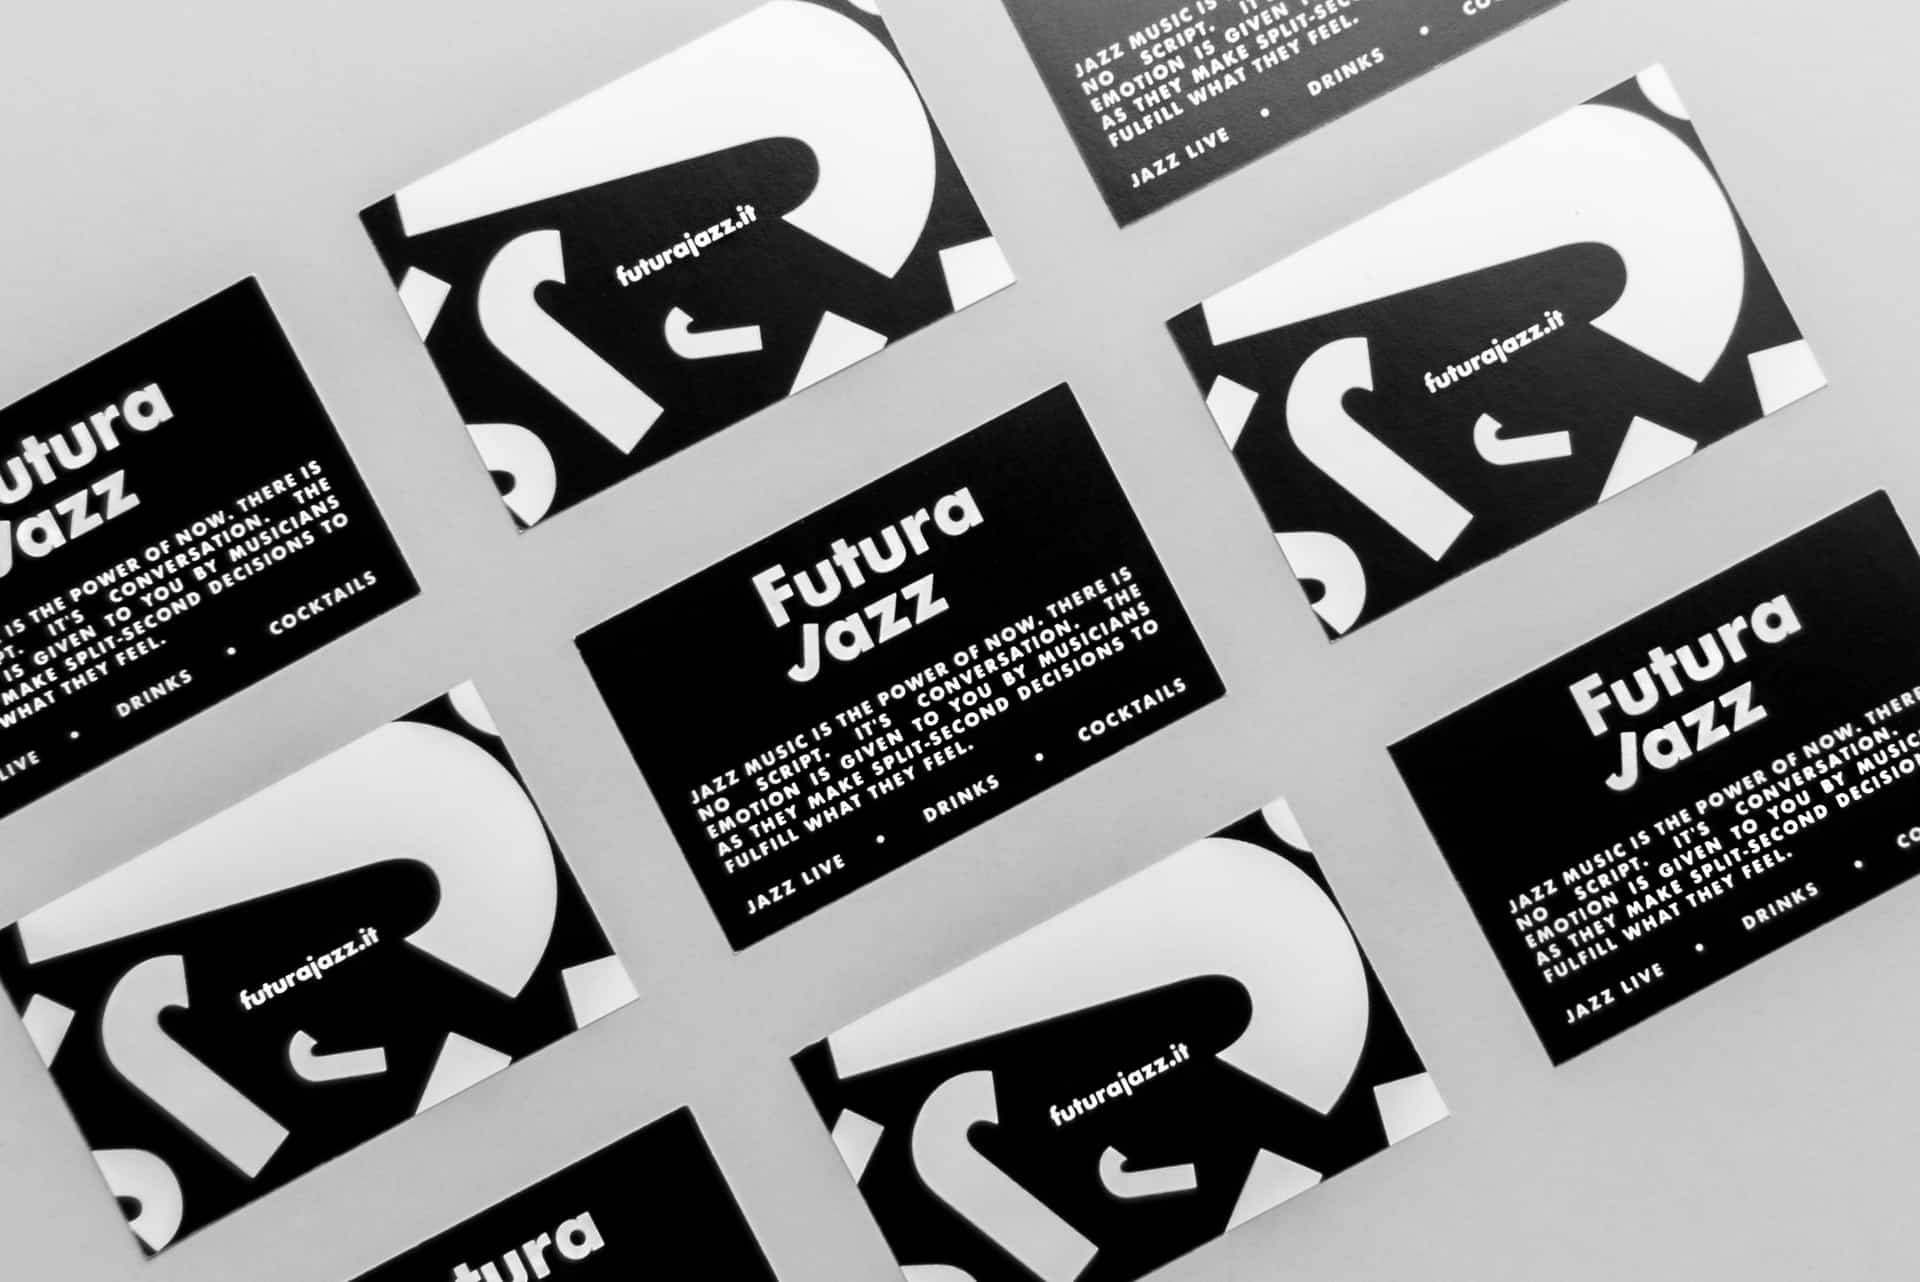 Futura Jazz Bar - Brand Identity